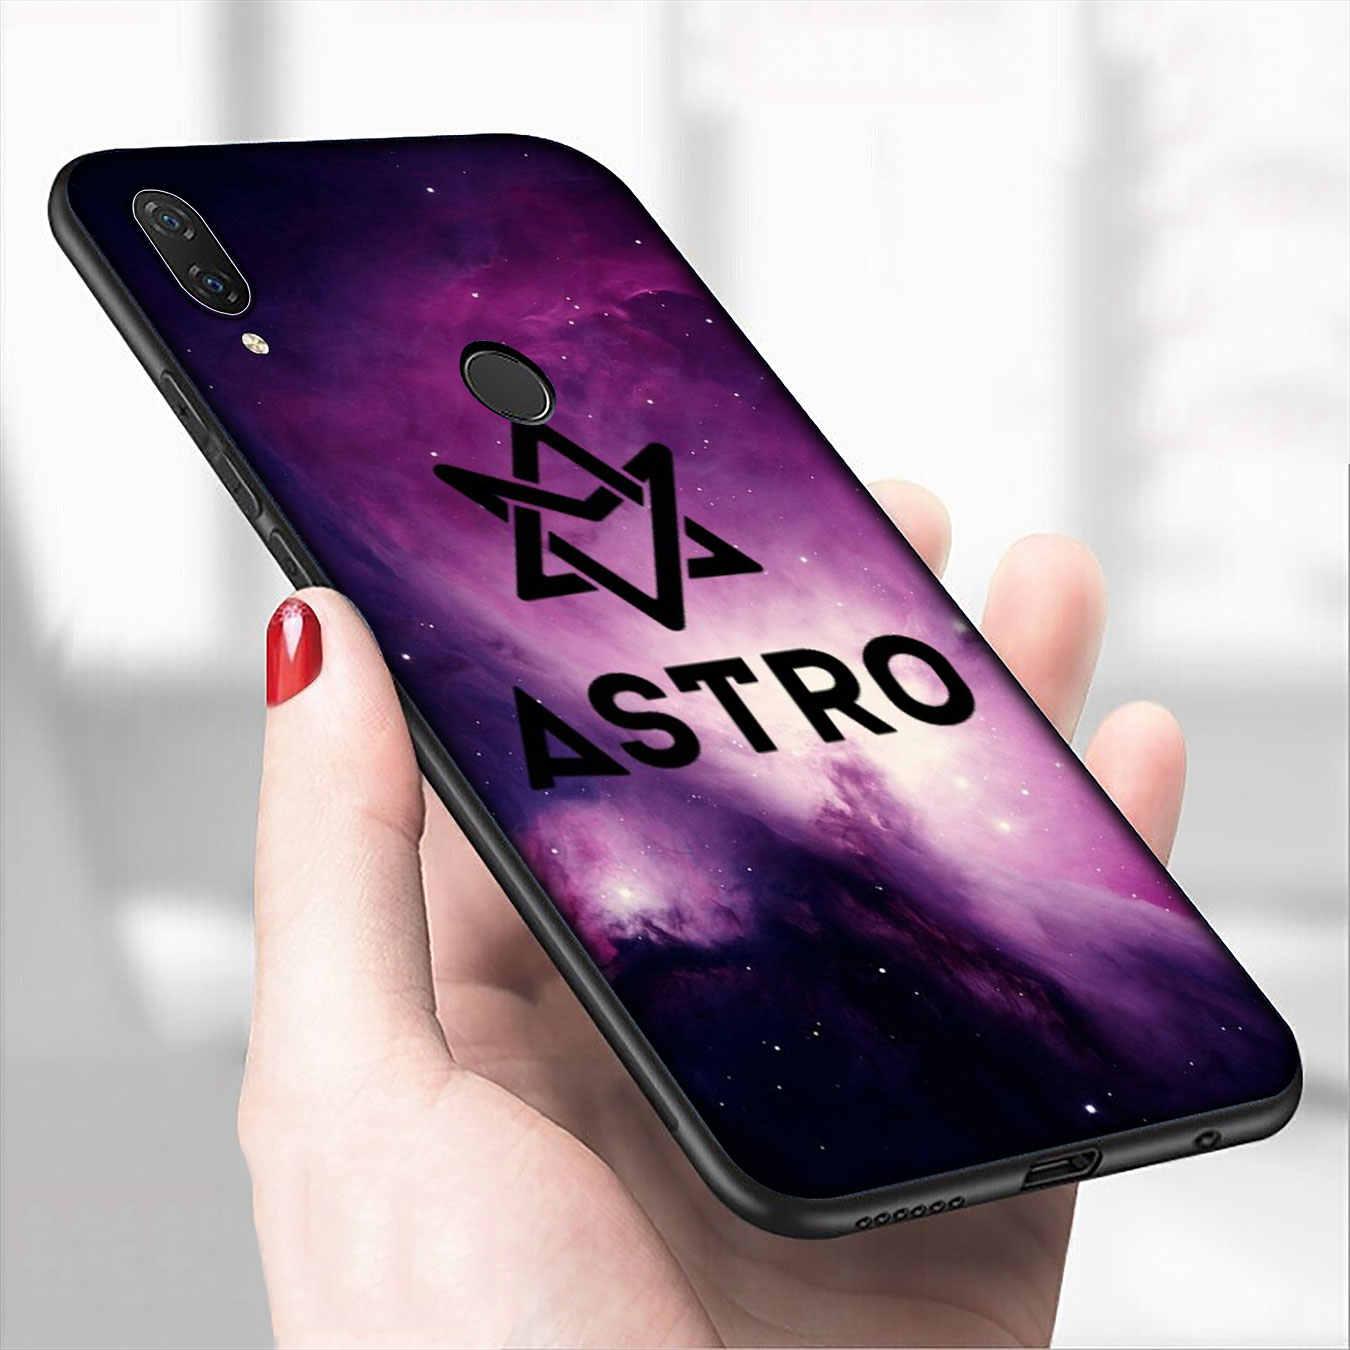 IYICAO KPOP ASTRO Hart vormige Zachte Siliconen Telefoon Case voor Xiaomi Redmi 8A 7A 6A 5A K20 S2 4A 4X note 8 7 6 Pro 5 Plus Cover